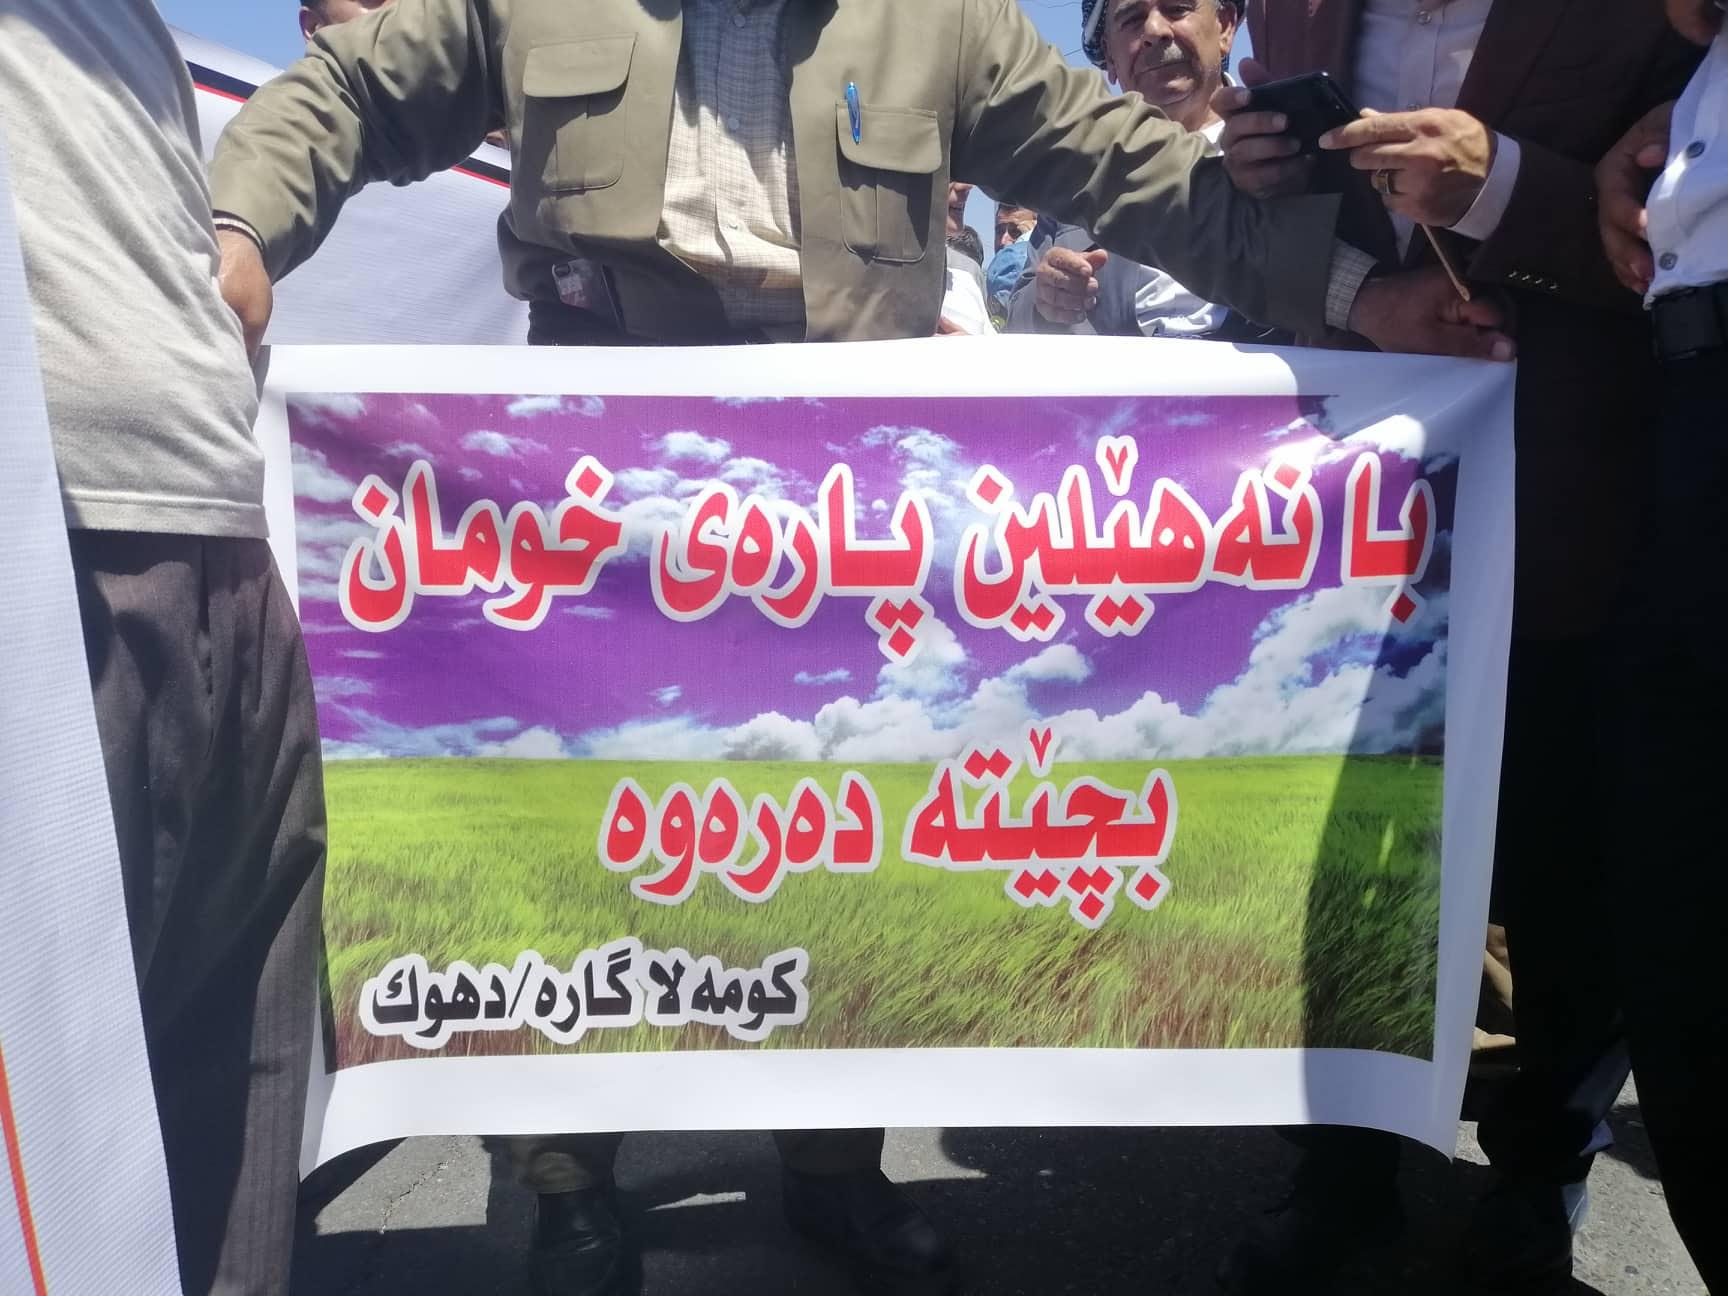 تظاهرات امام برلمان اقليم كوردستان تطالب بحظر استيراد الدجاج